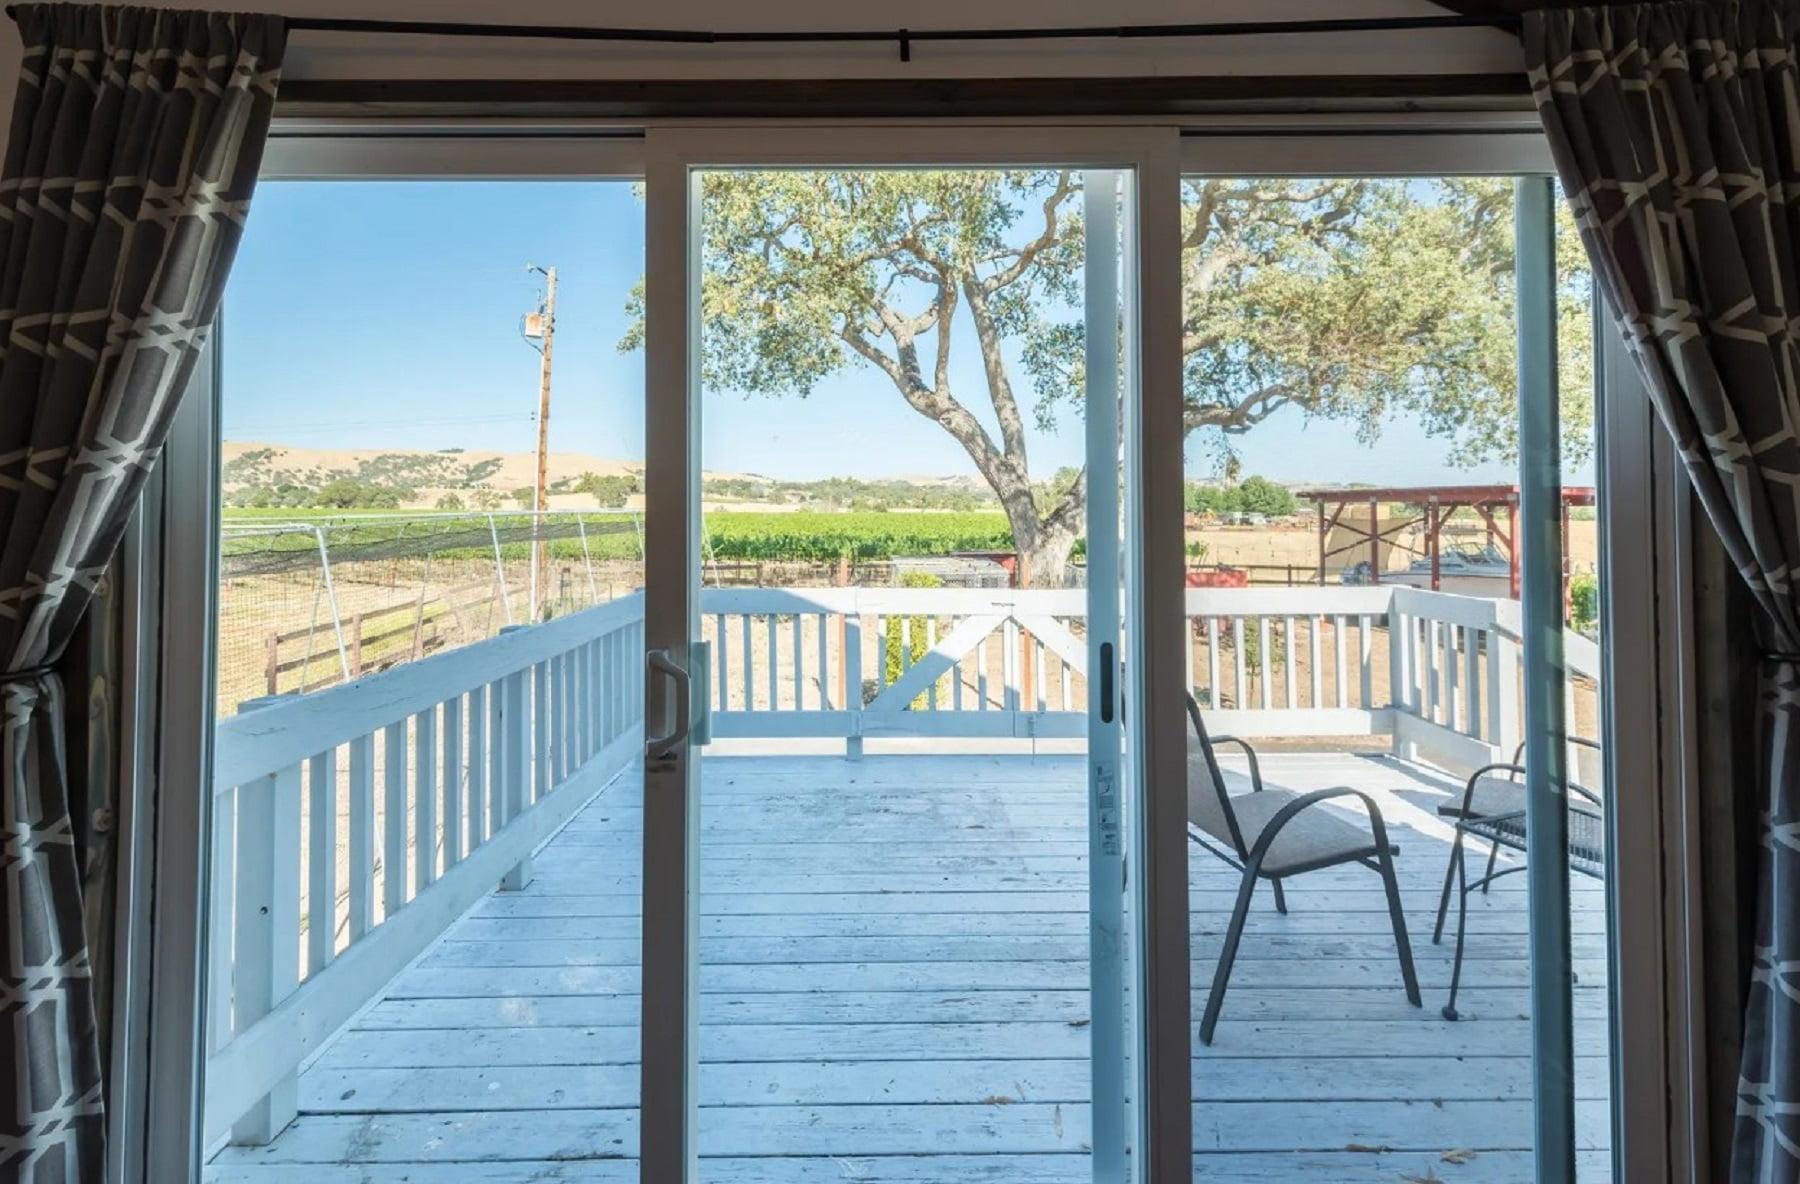 Rancho Da Hamilton - Loft bedroom view to patio